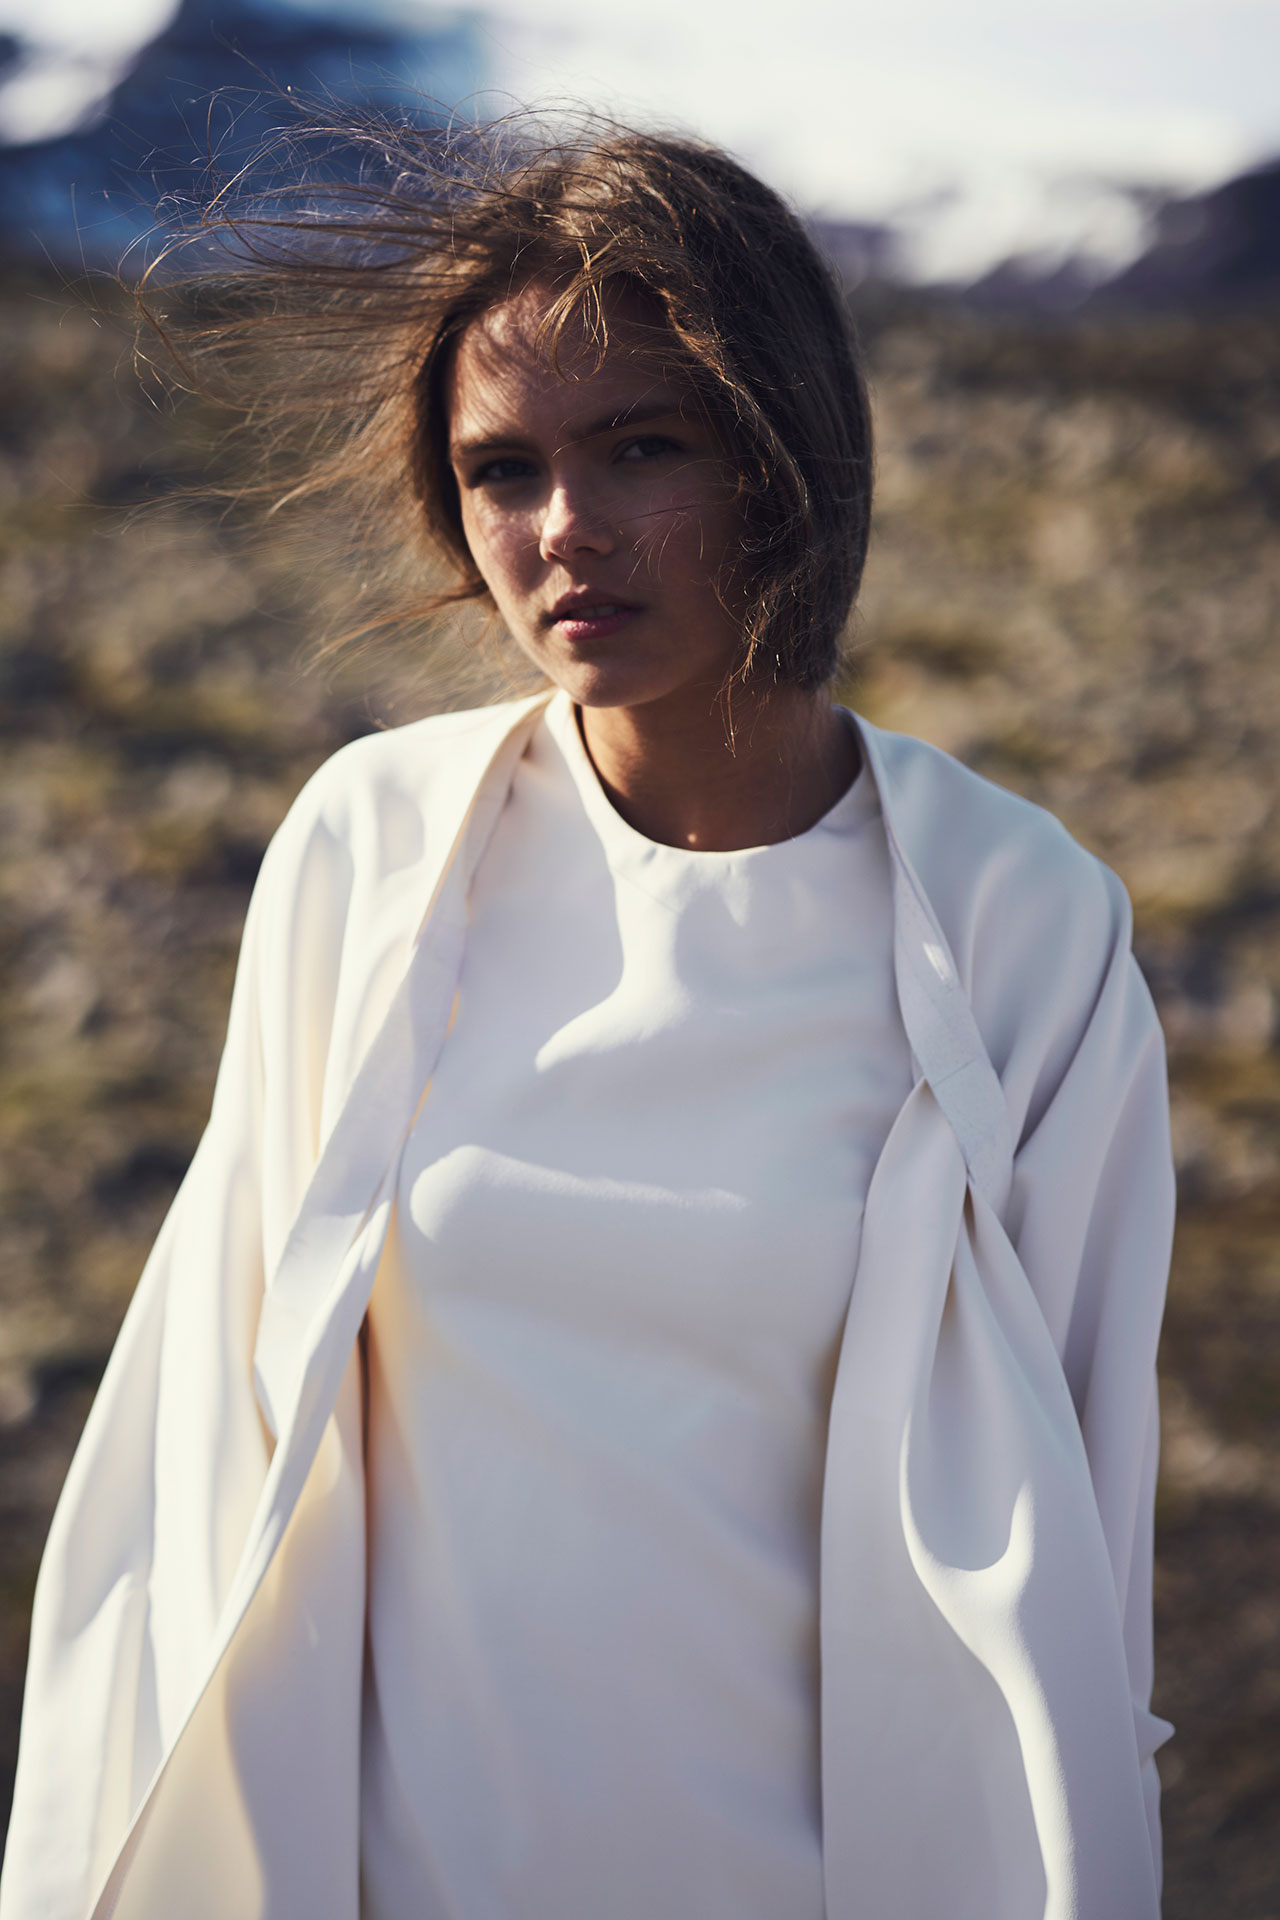 Félicie Eymard, Dress Coat, from Metamorphosis Collection. Photo by Julien Hayard.